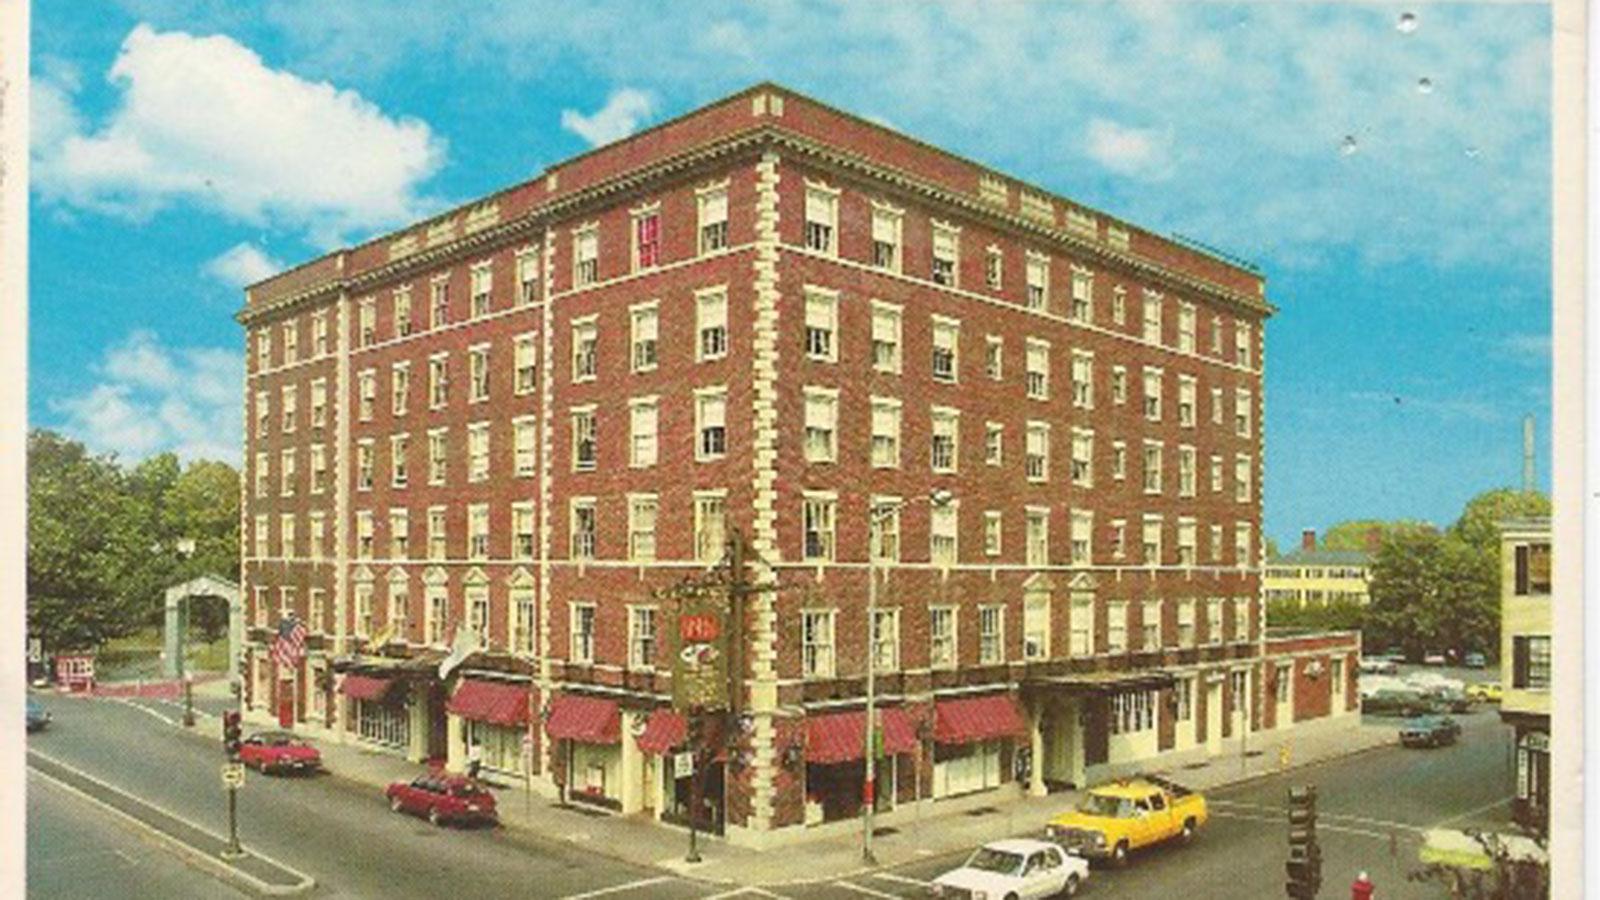 Historic image of lobby Hawthorne Hotel, 1925, Member of Historic Hotels of America, in Salem, Massachusetts, Discover